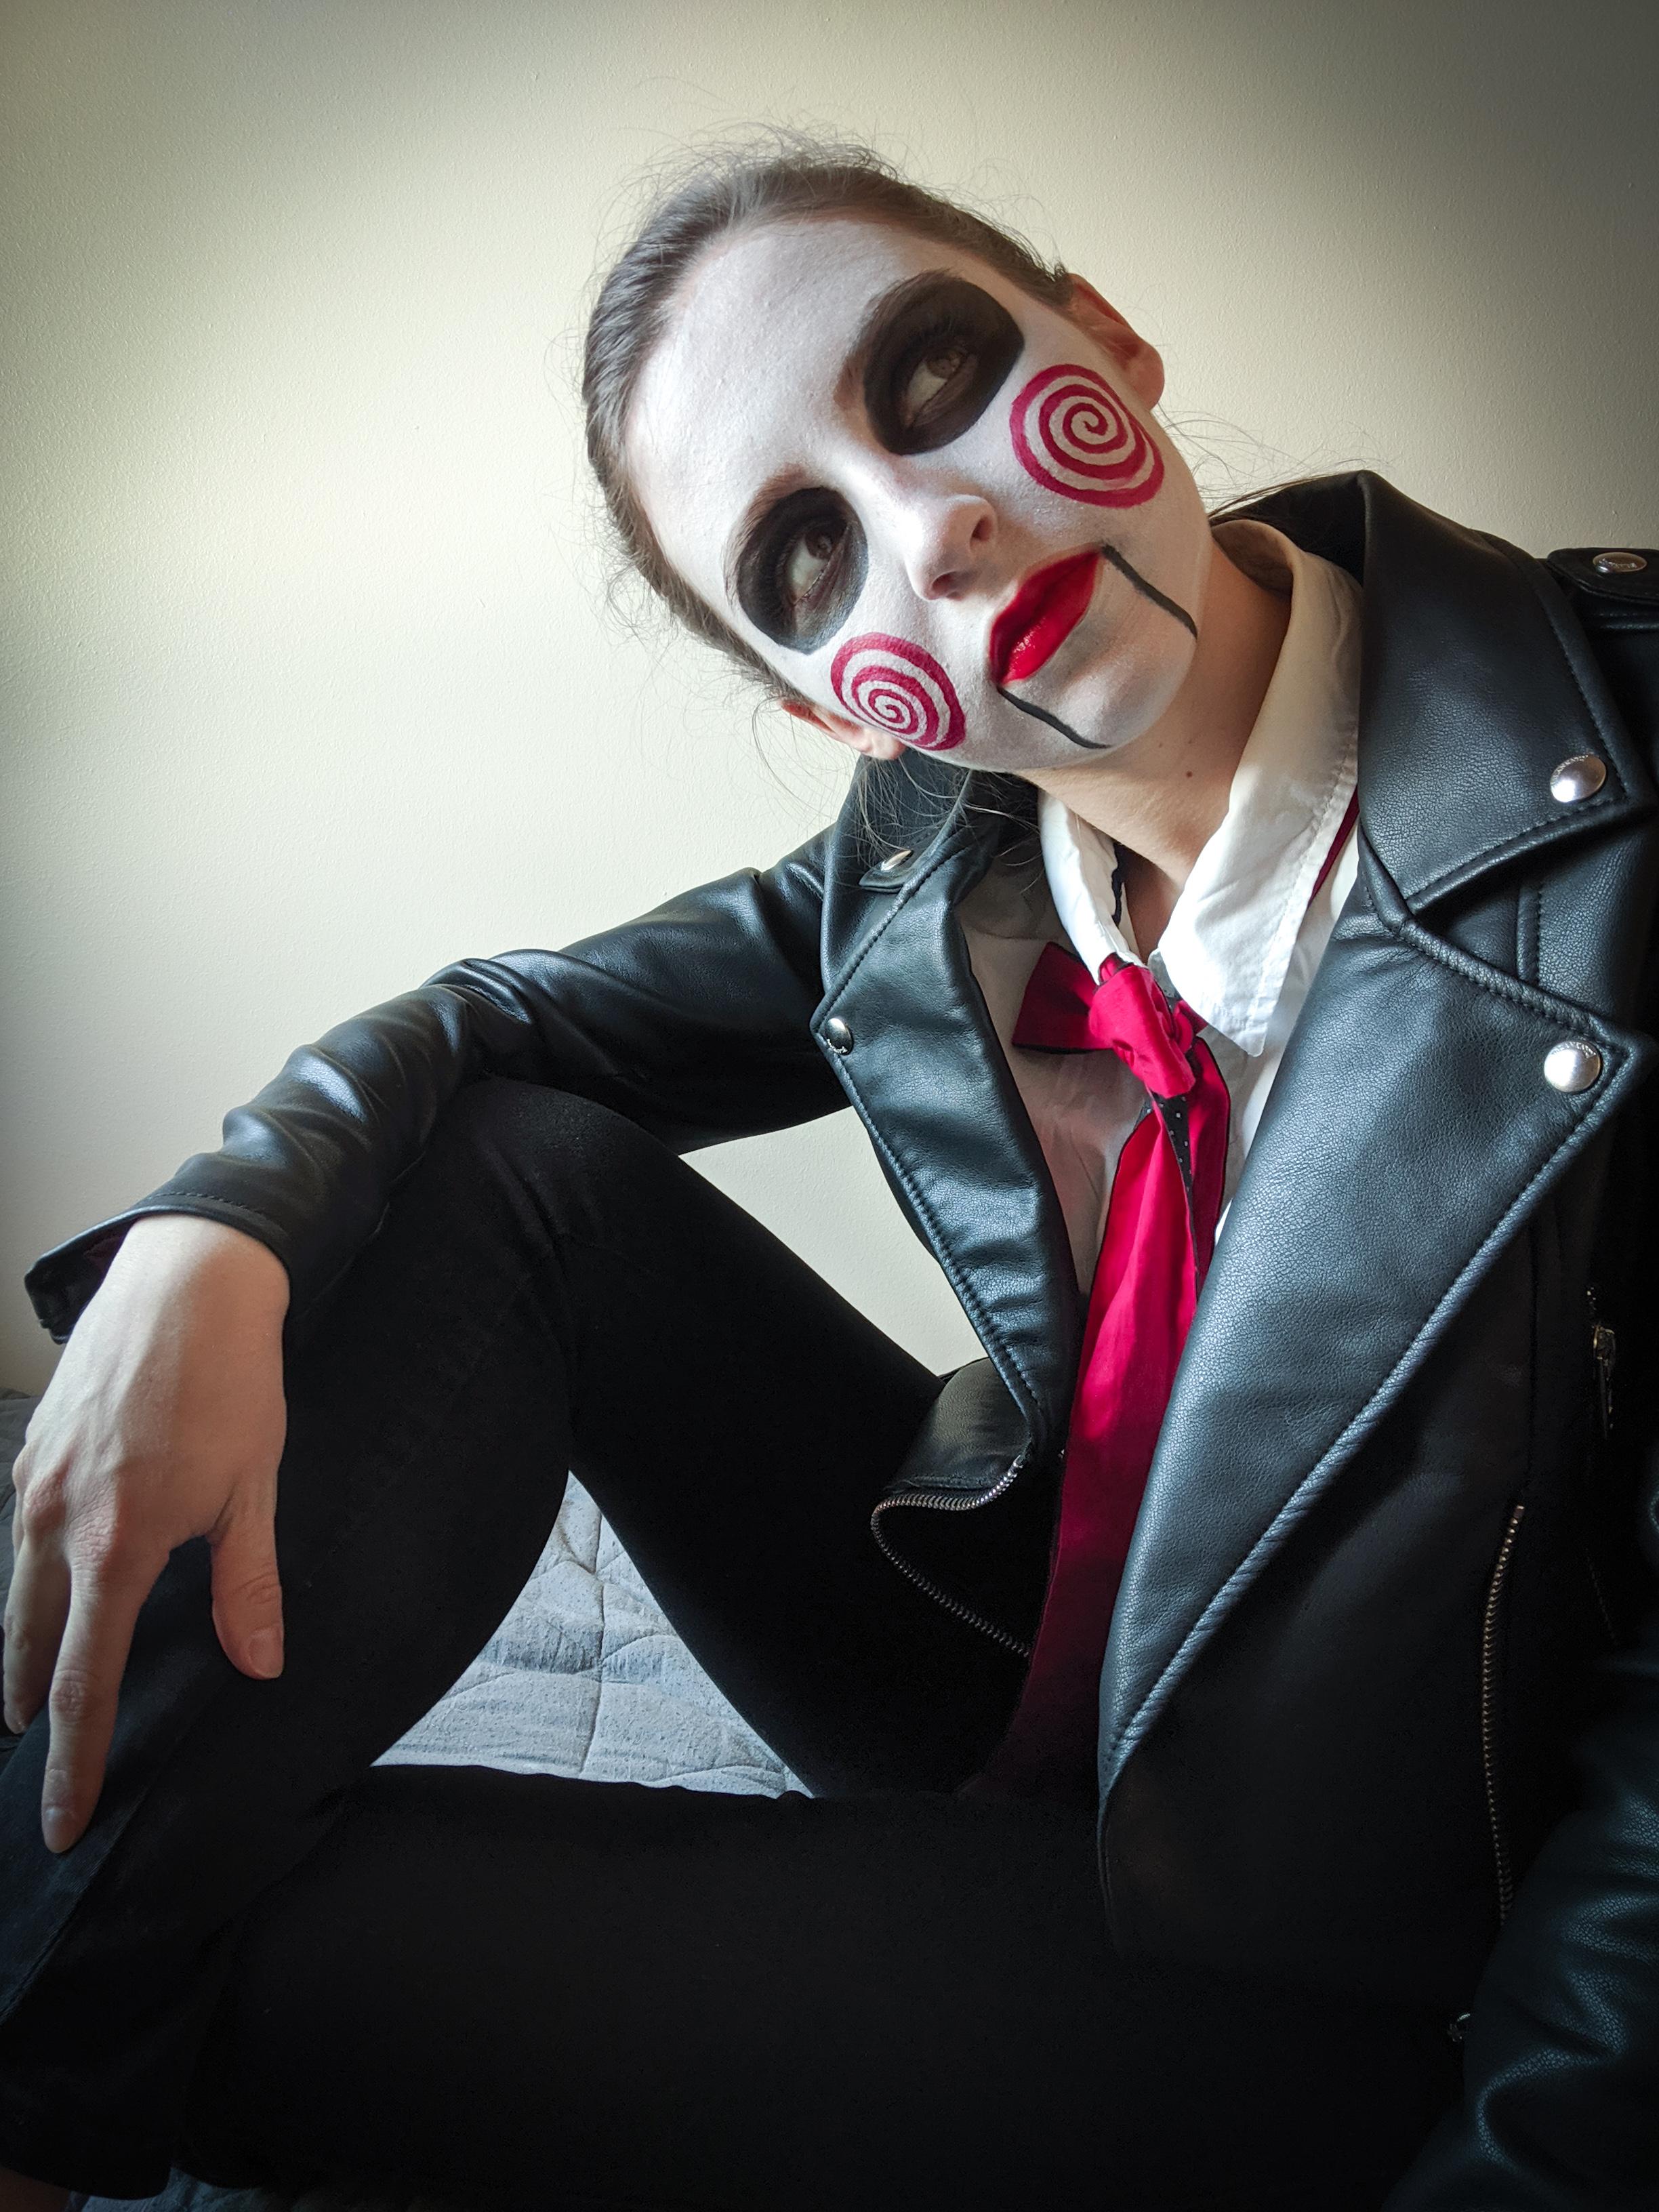 Halloween costume, creepy costume, face paint